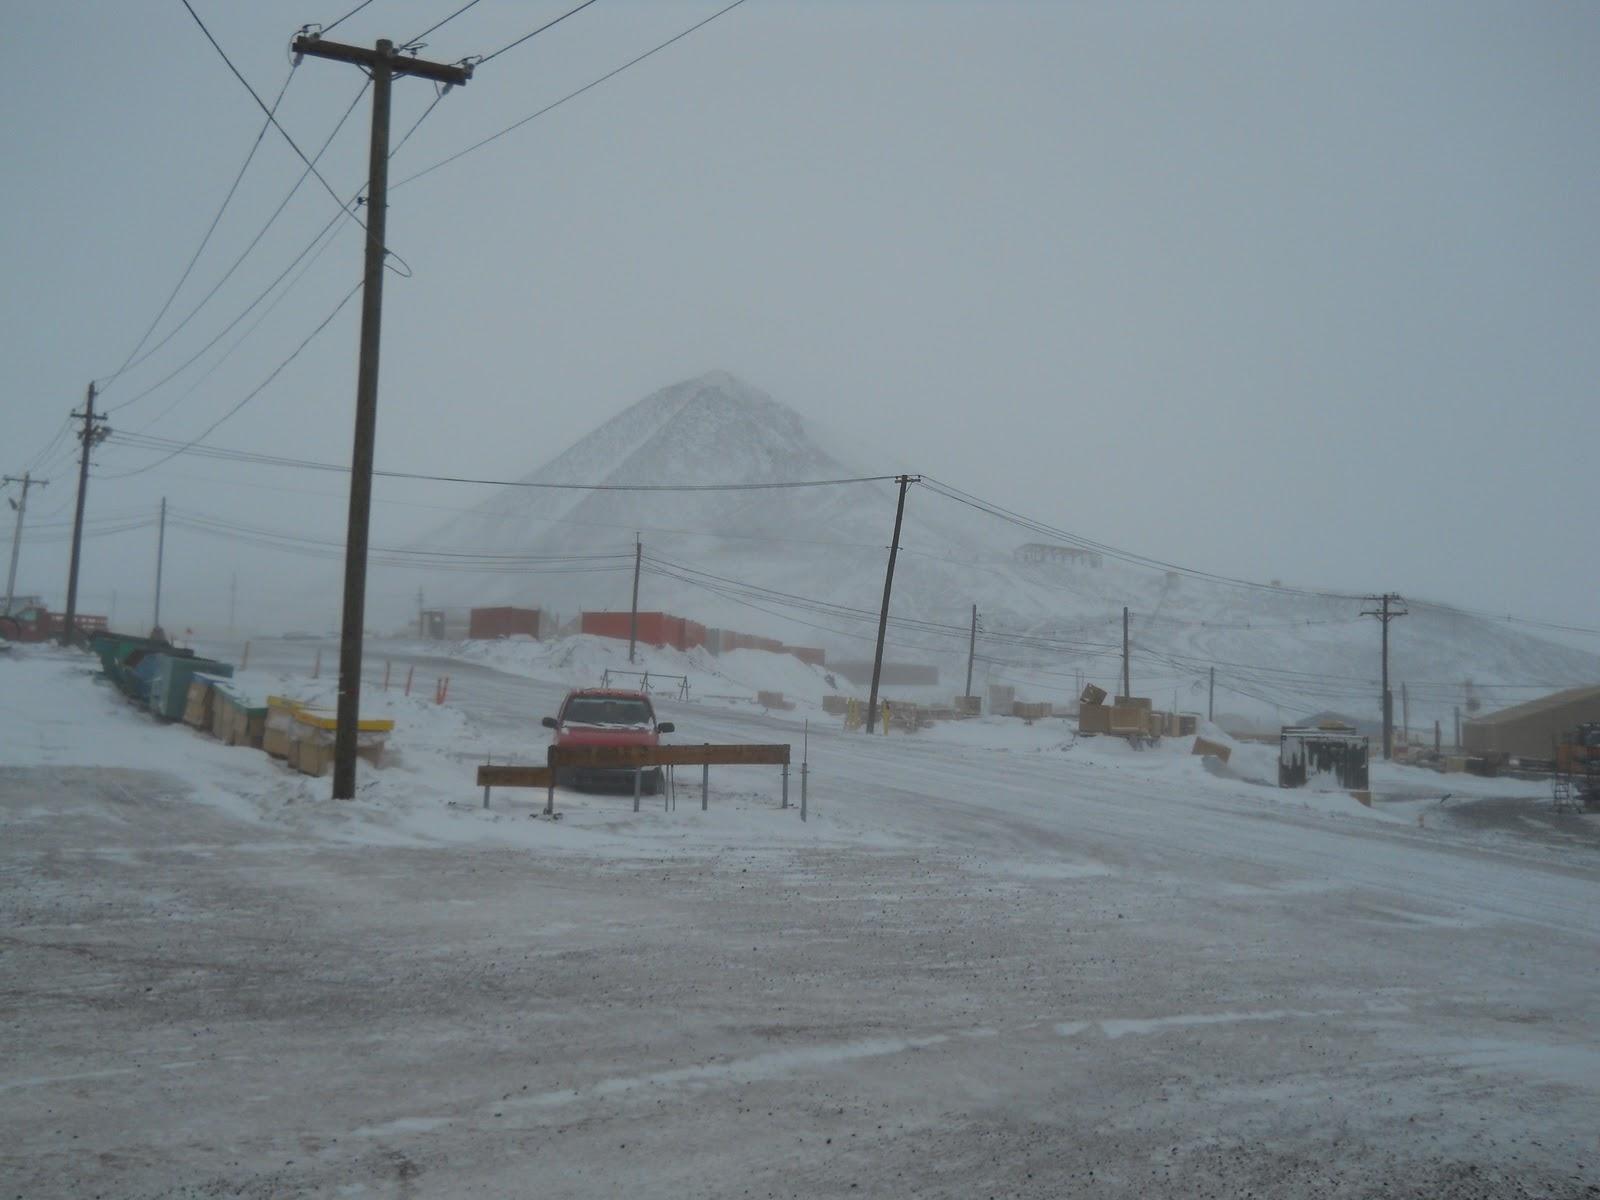 http://2.bp.blogspot.com/_X68YV7rf7_s/TK357yQj7DI/AAAAAAAAAEA/bNNEkzp8TUA/s1600/Antarctica+391.jpg